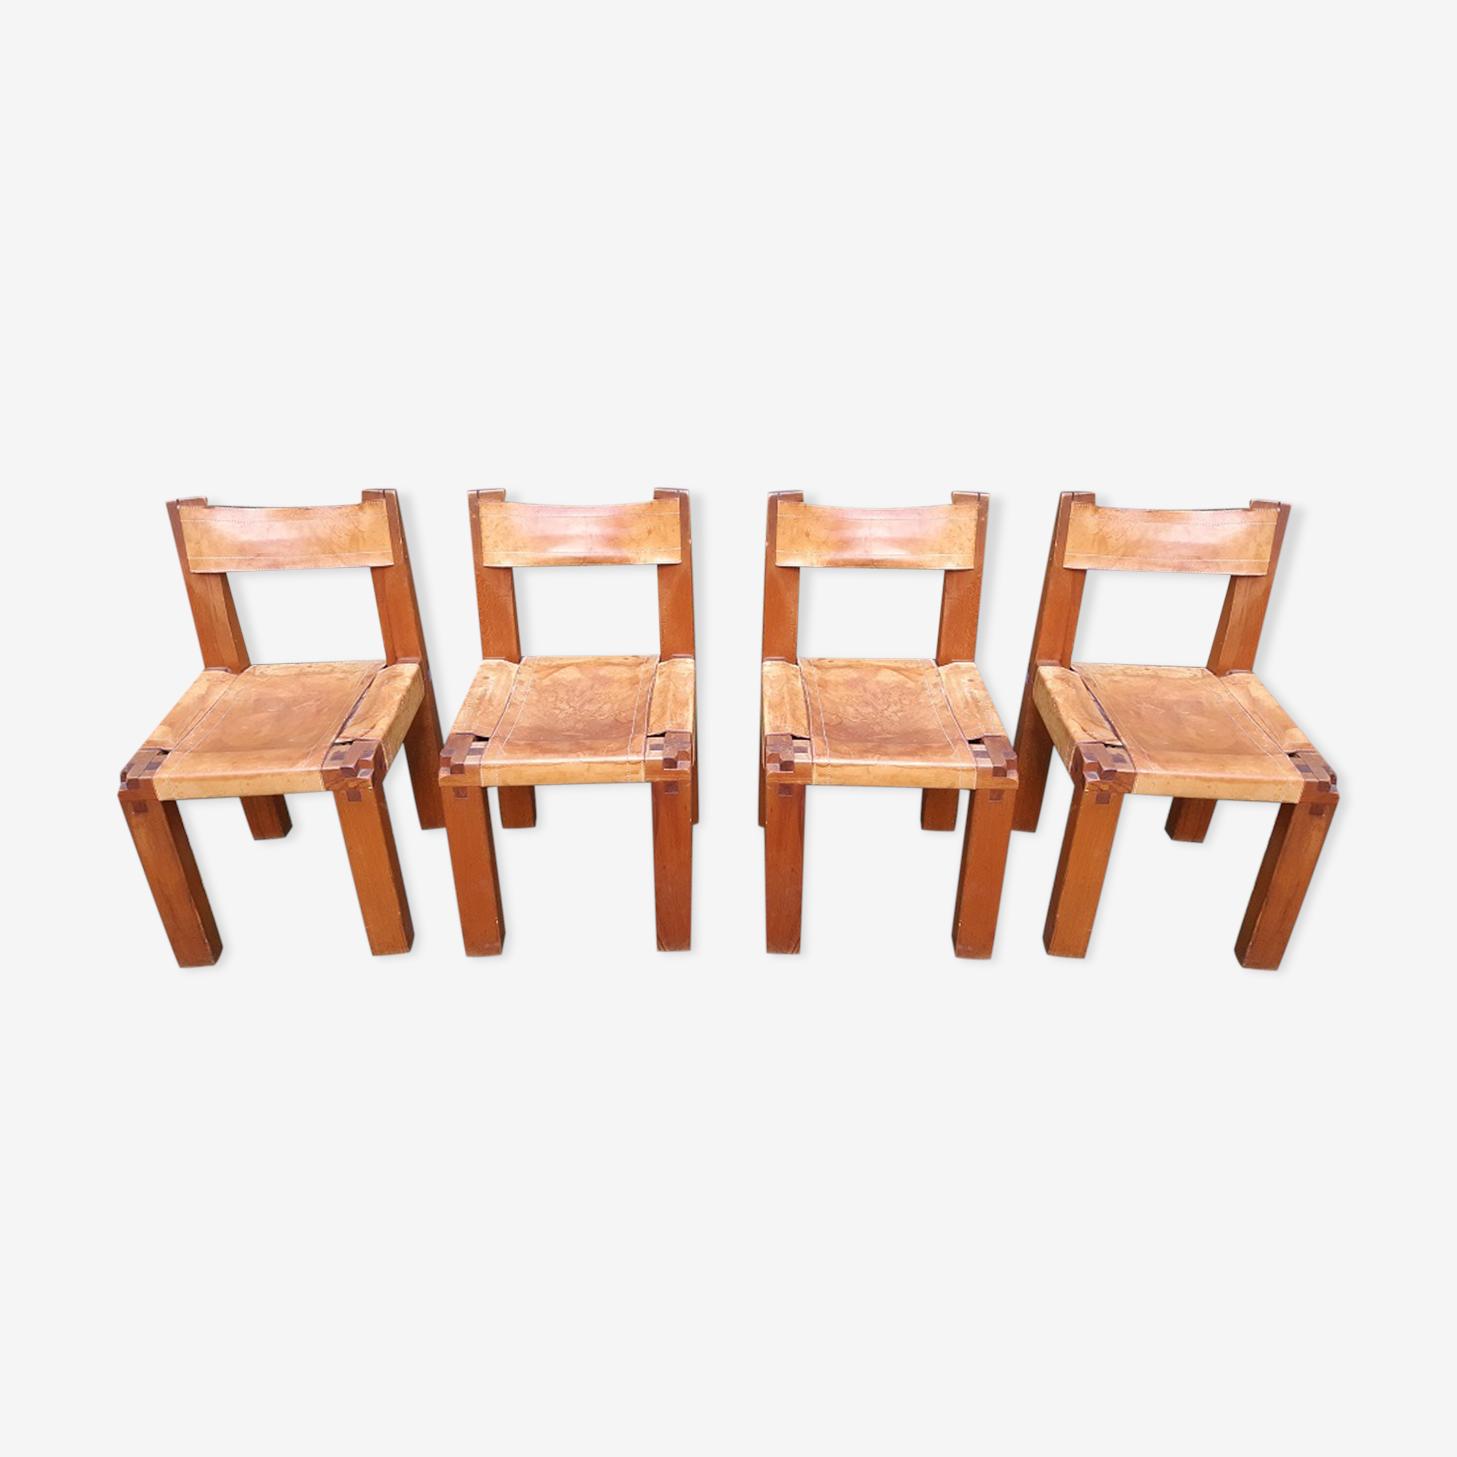 4 chairs Pierre Chapo